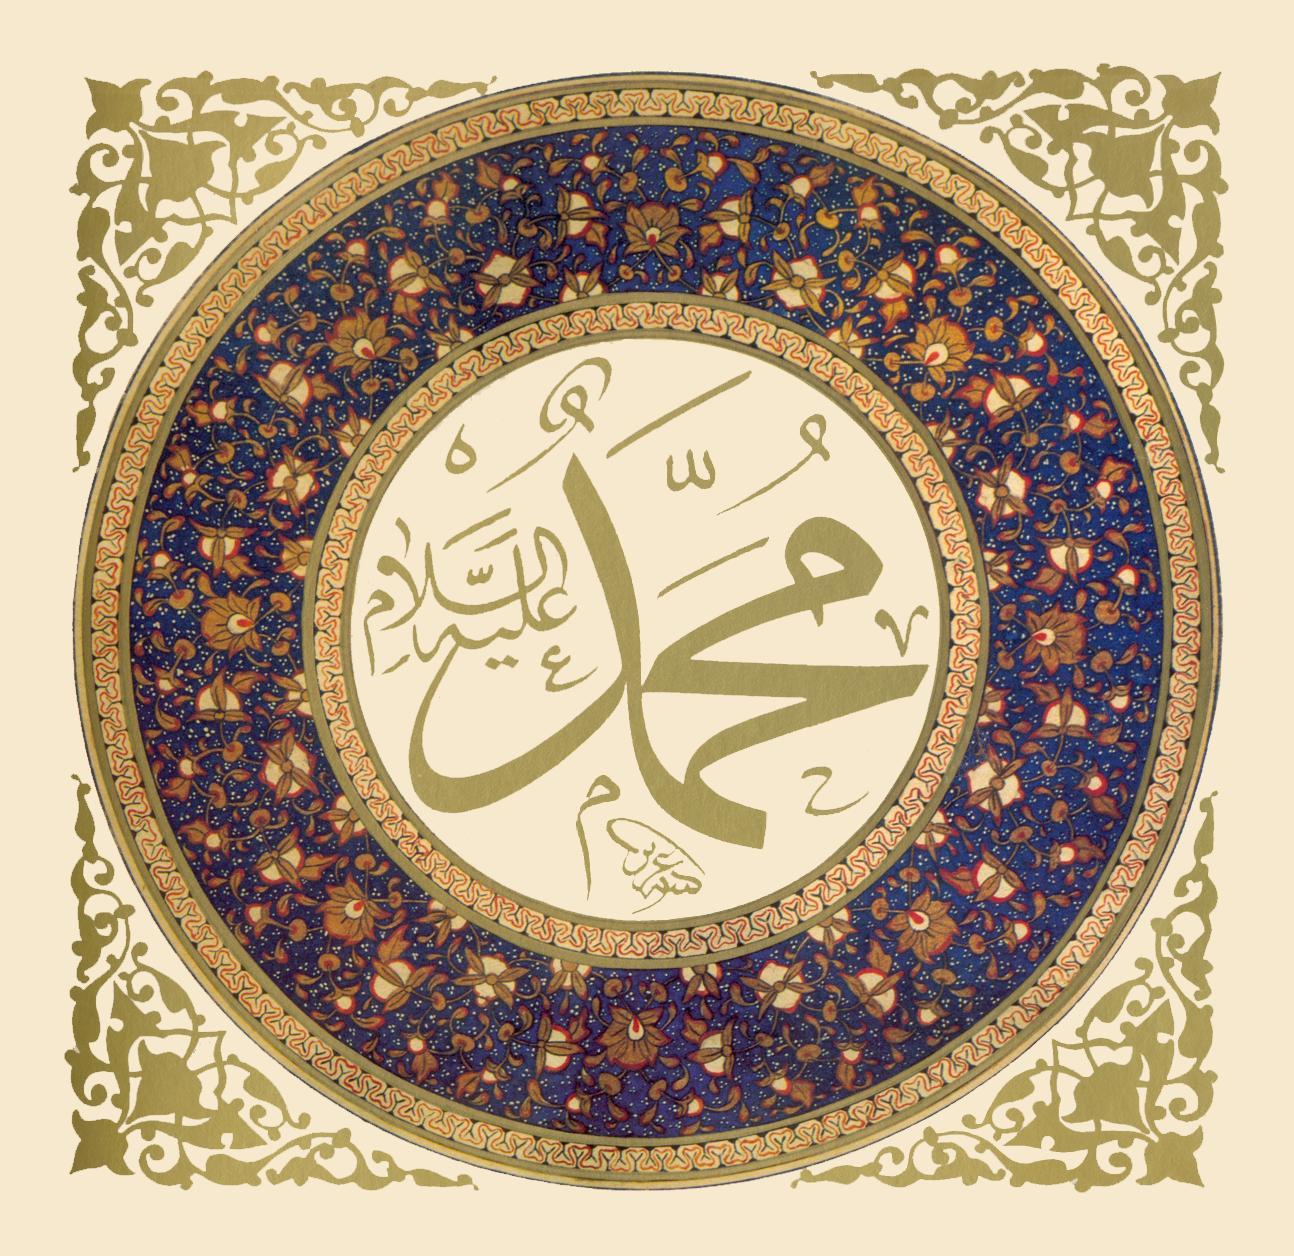 aziz_efendi-muhammad_alayhi_s-salam